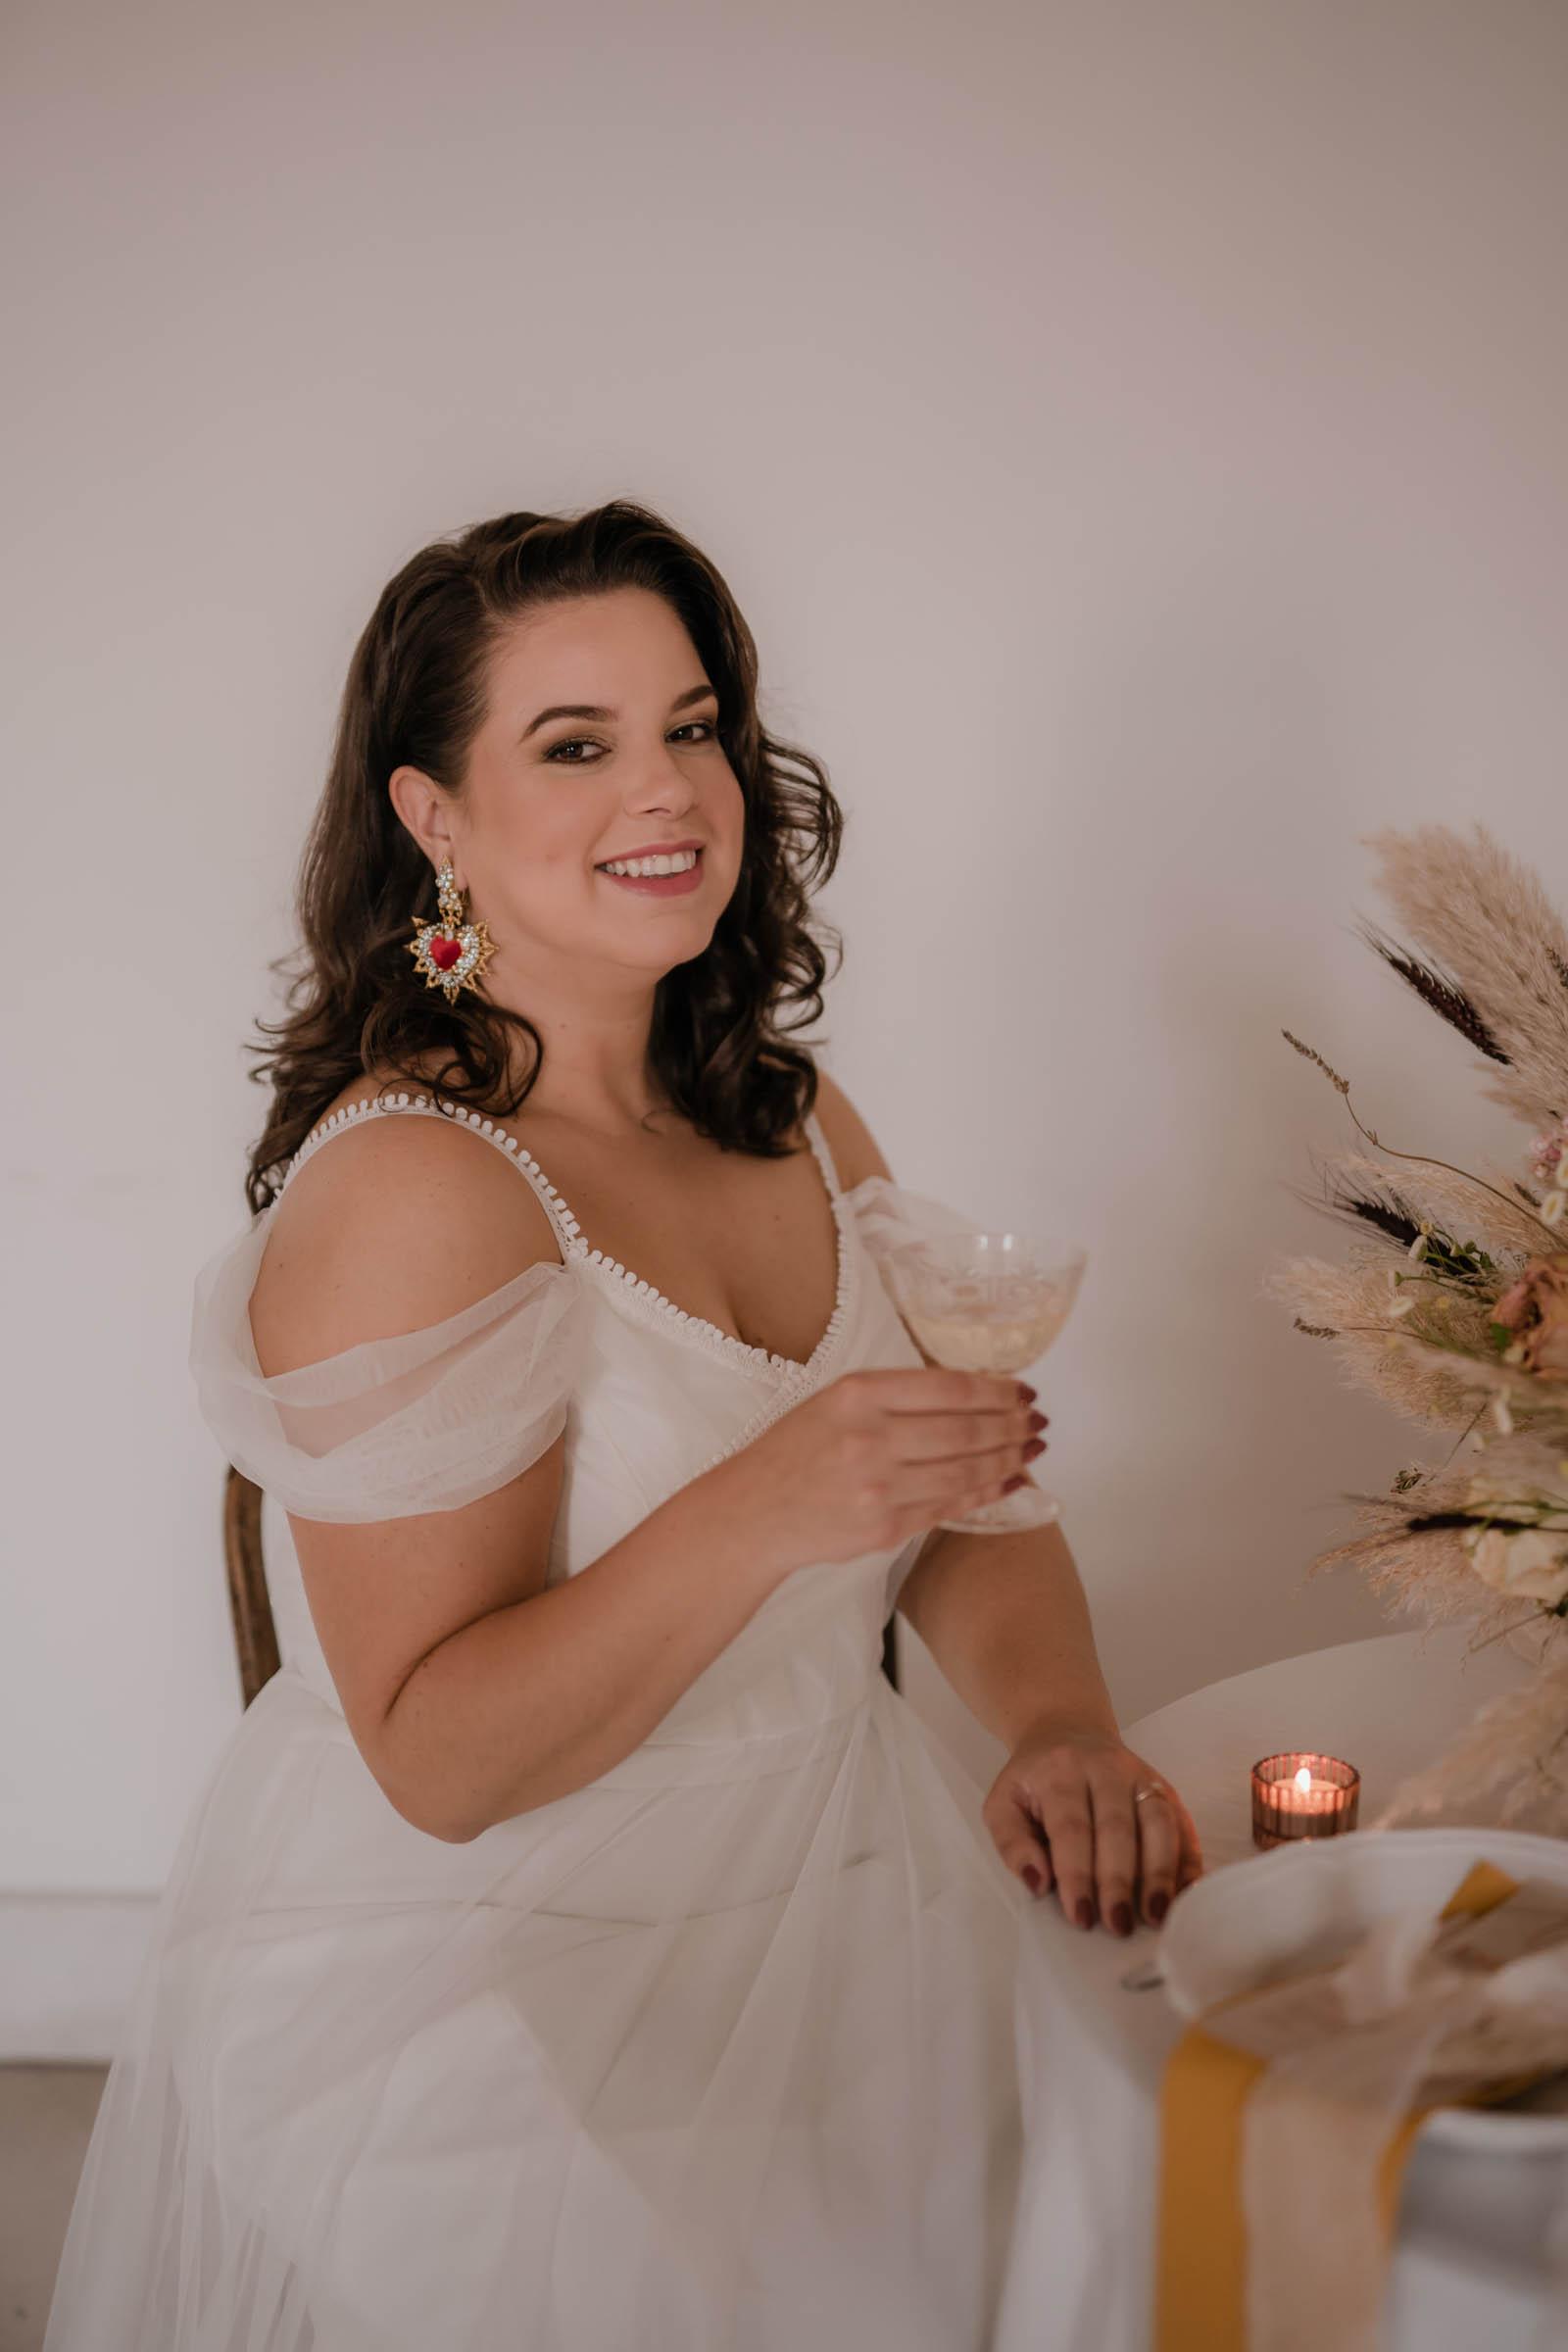 boho-svadobne-saty-veronika-kostkova-wedding-atelier-2019-tia